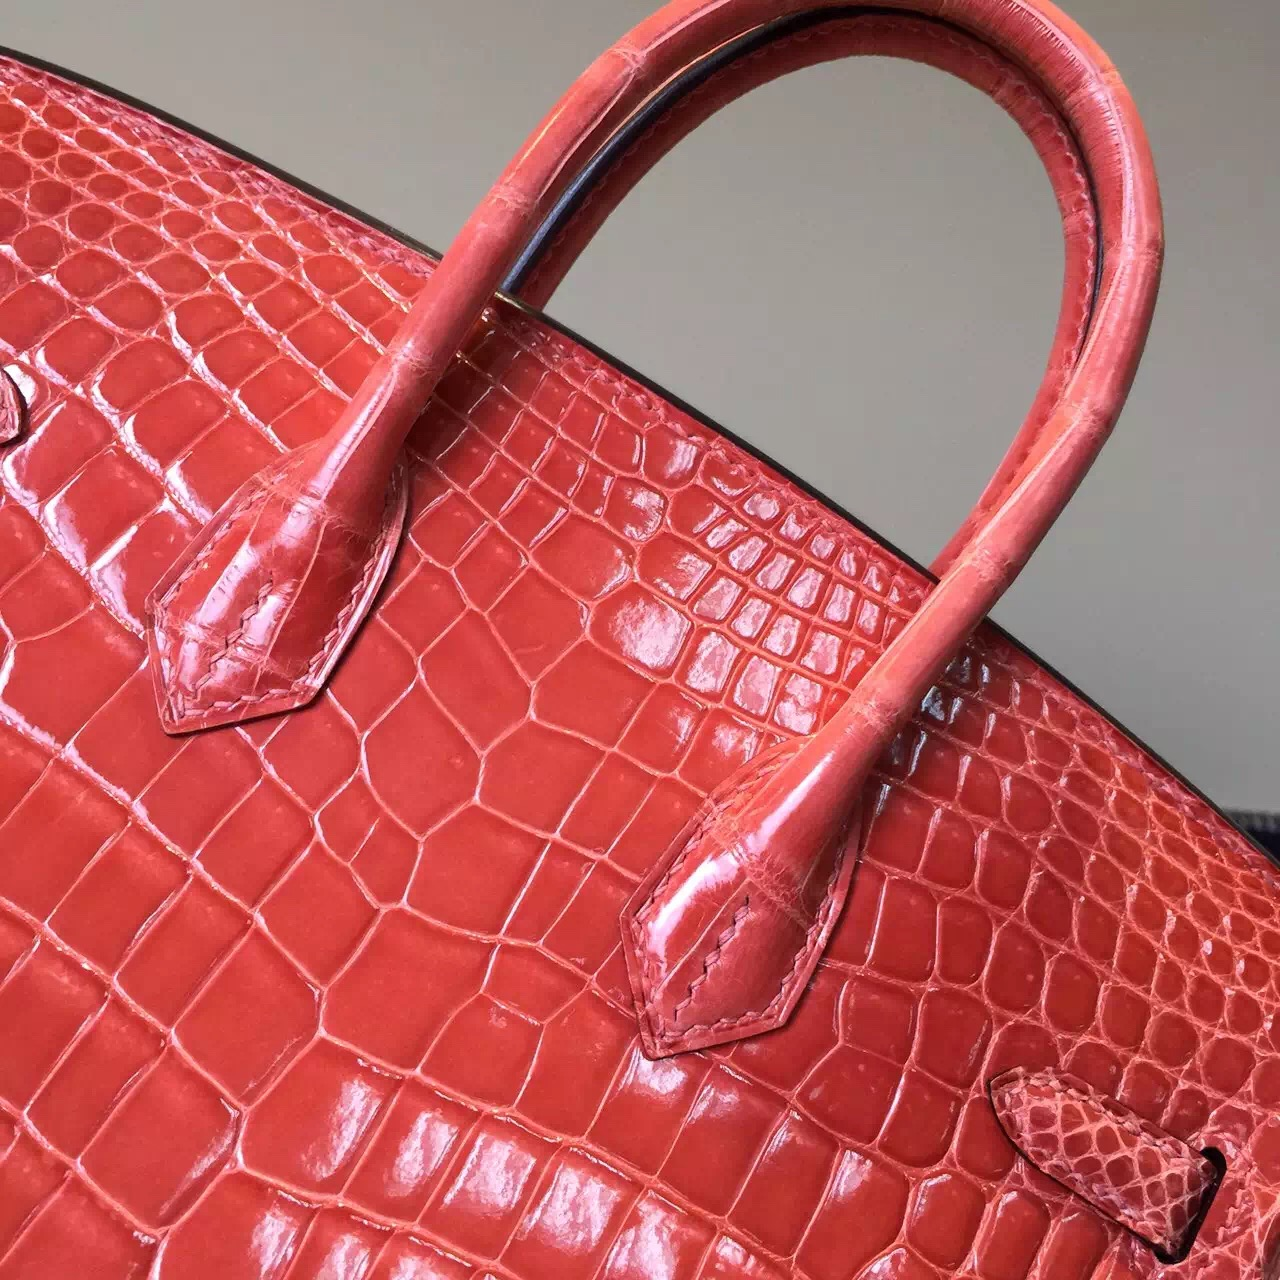 Hand Stitching Hermes L5 Crevette Color Crocodile Shiny Leather Birkin25cm